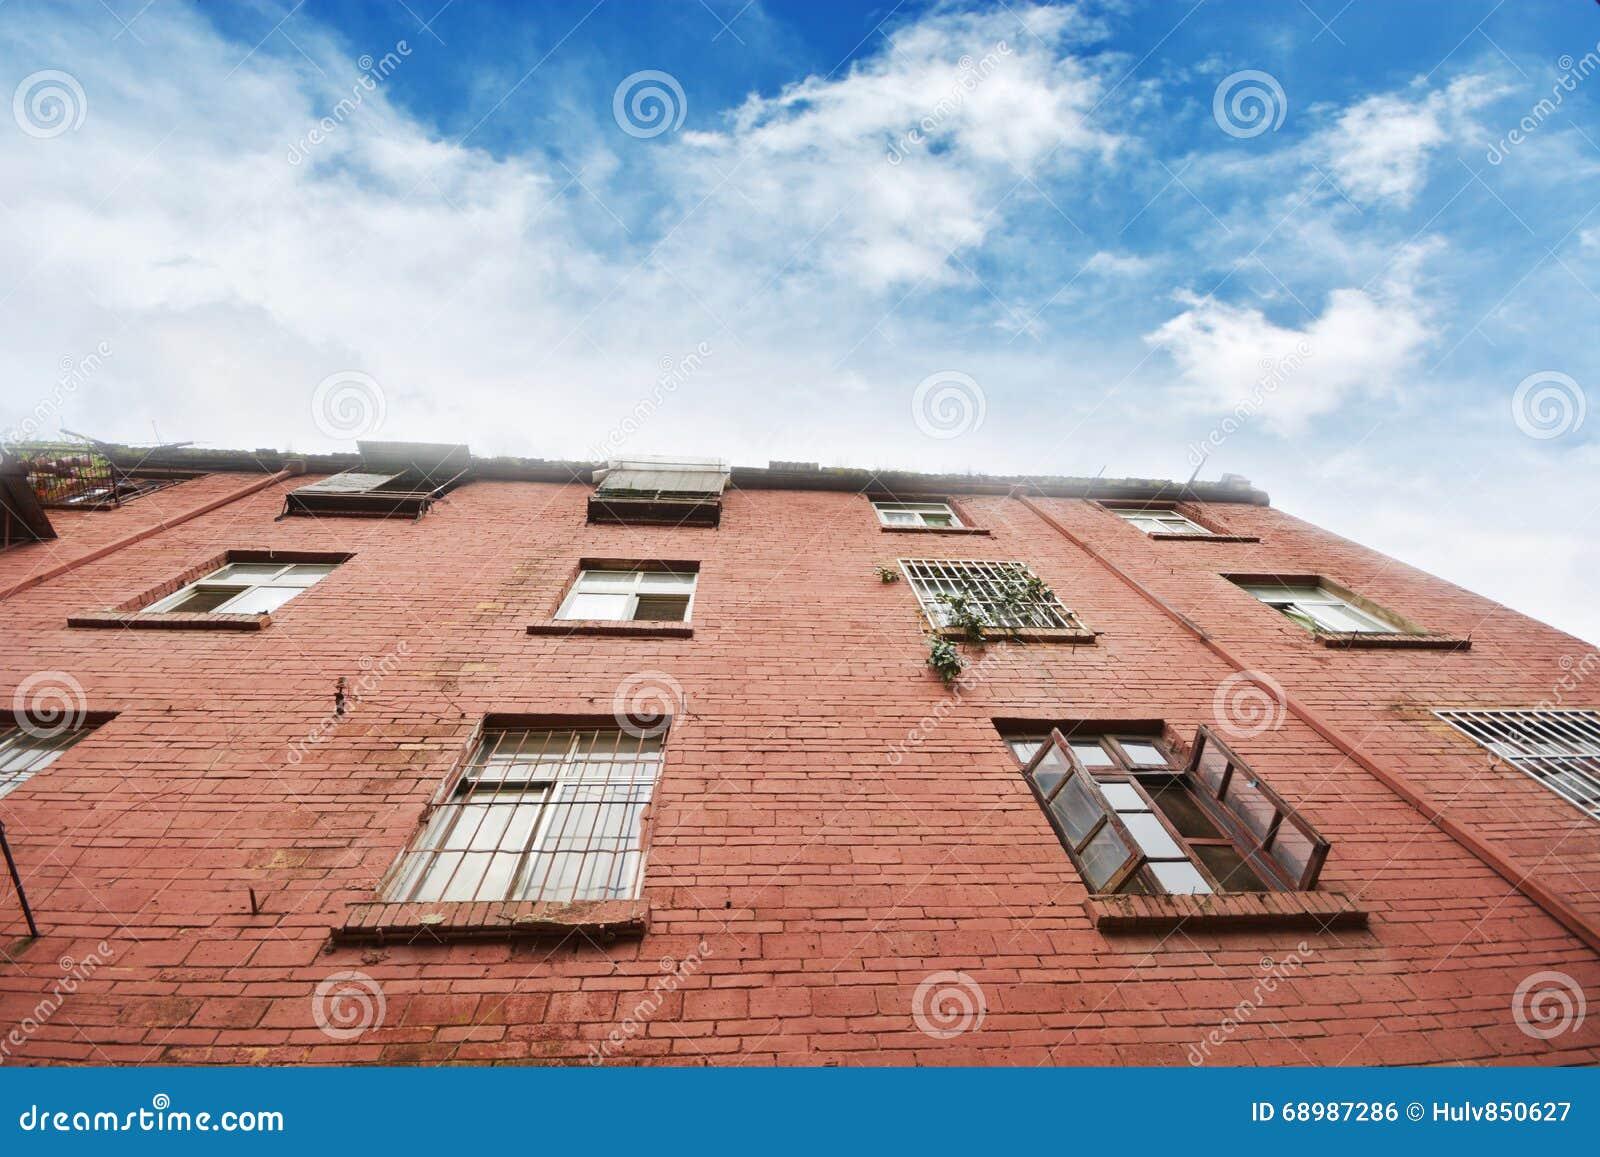 Старые квартиры с голубым небом